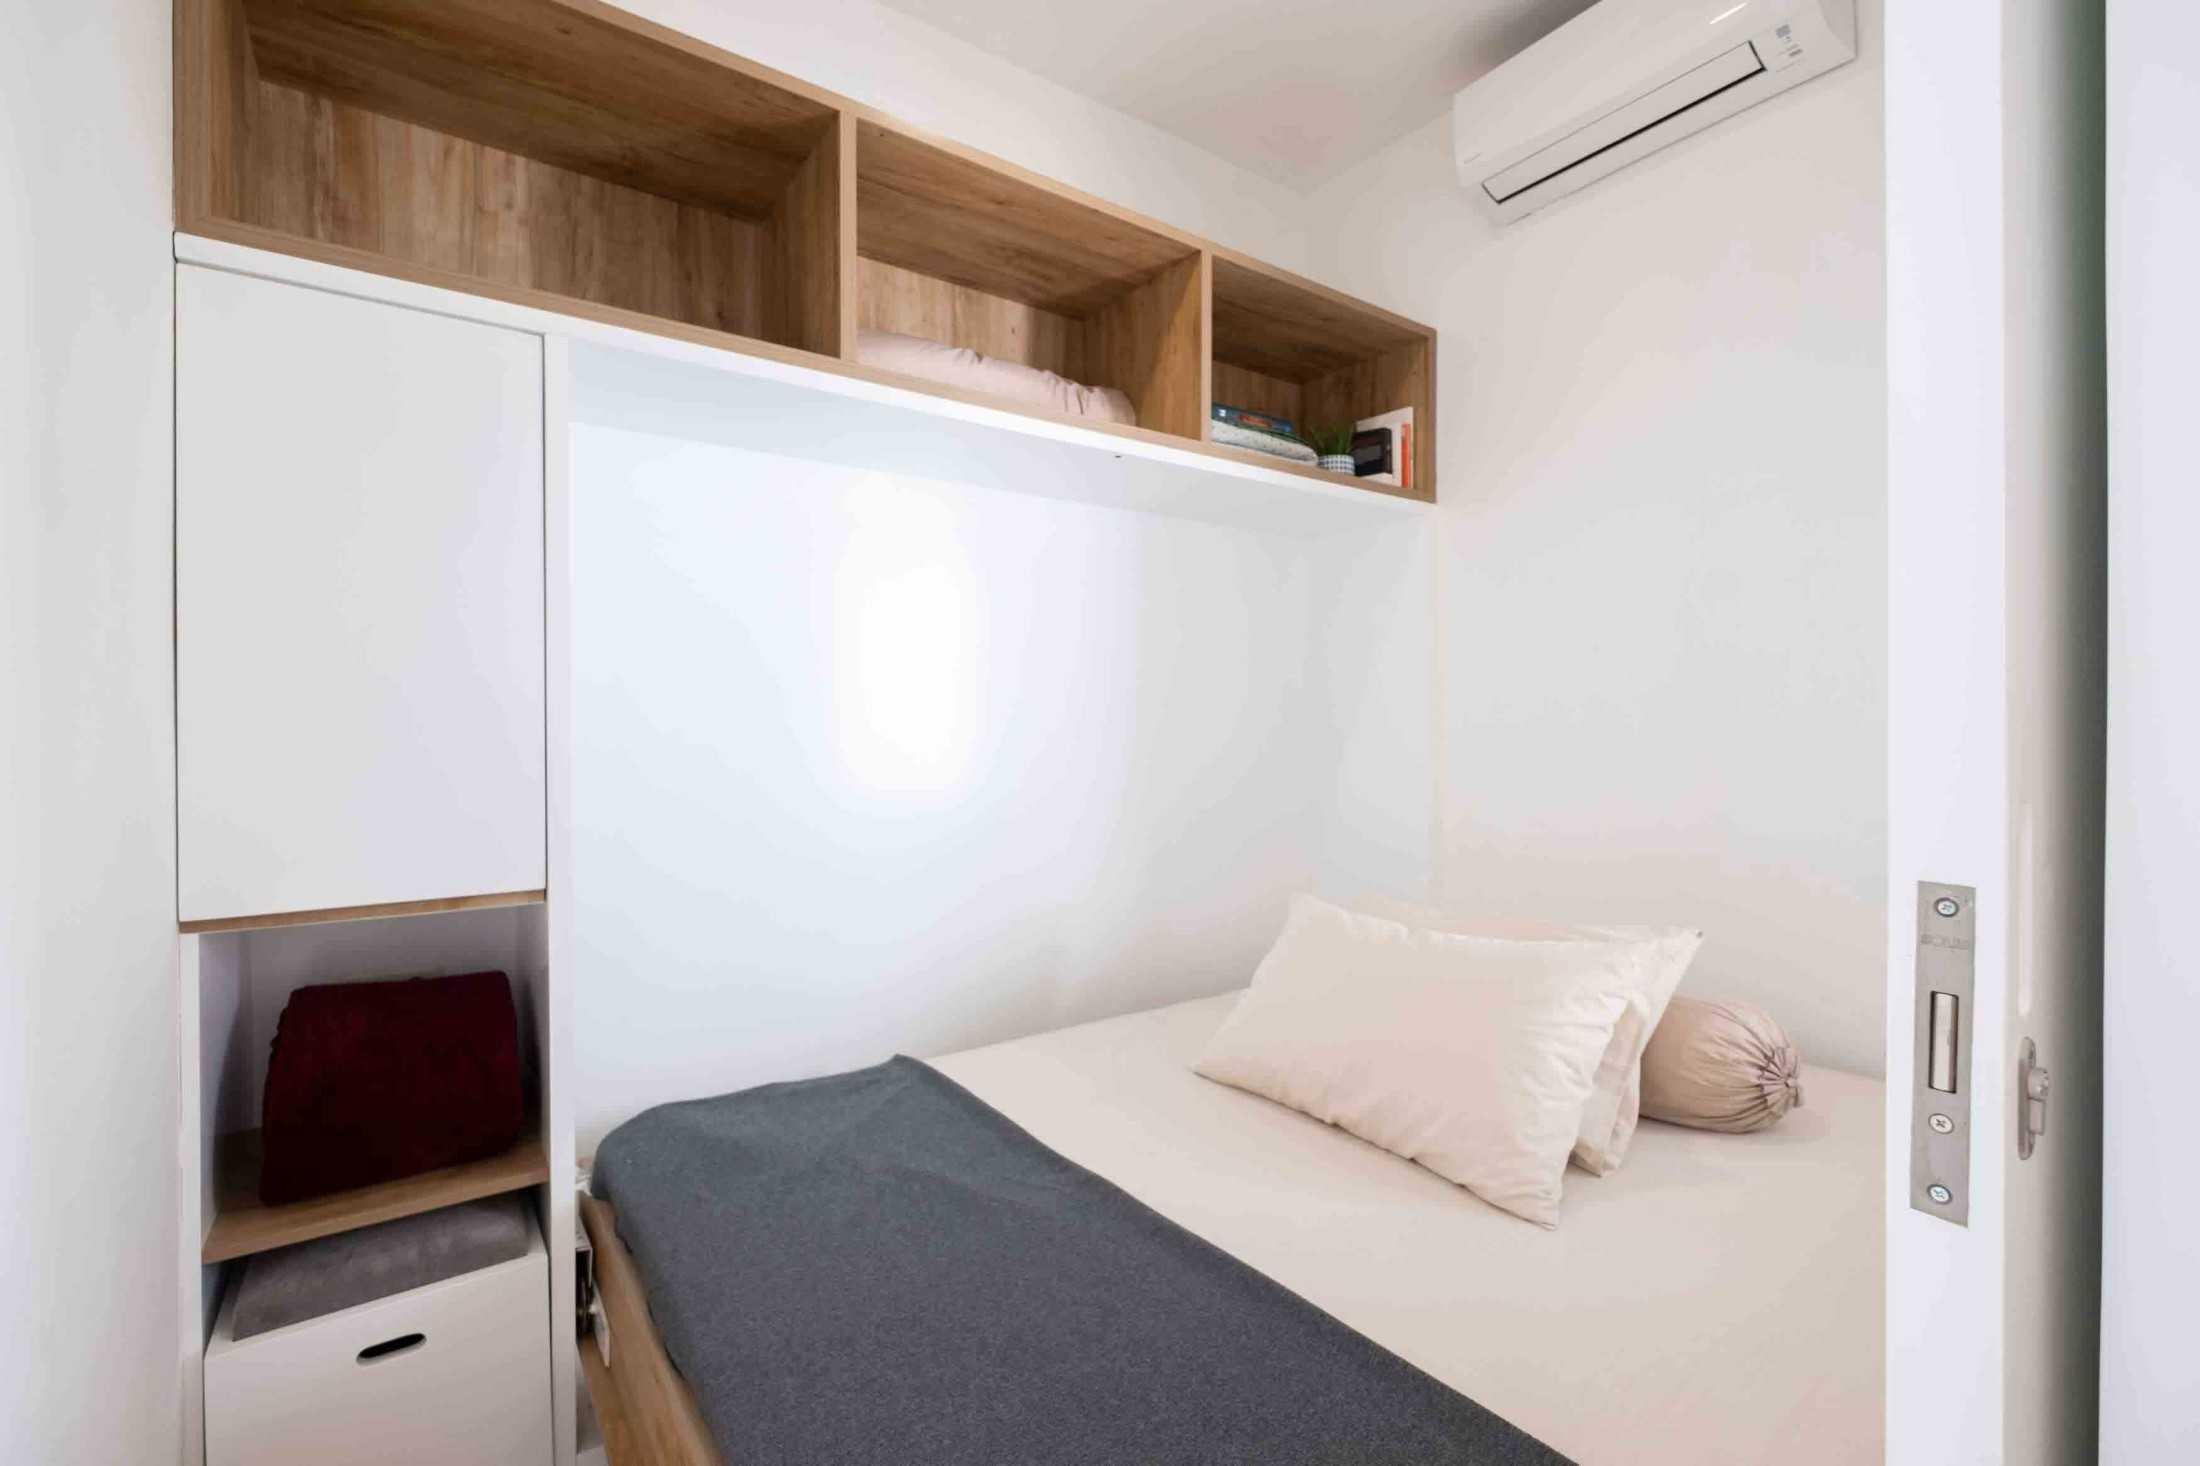 Murphy bed saat diguanakan sebagai tempat tidur, kamar tidur karya Fiano dan Aksioma Design & Construction, via arsitag.com